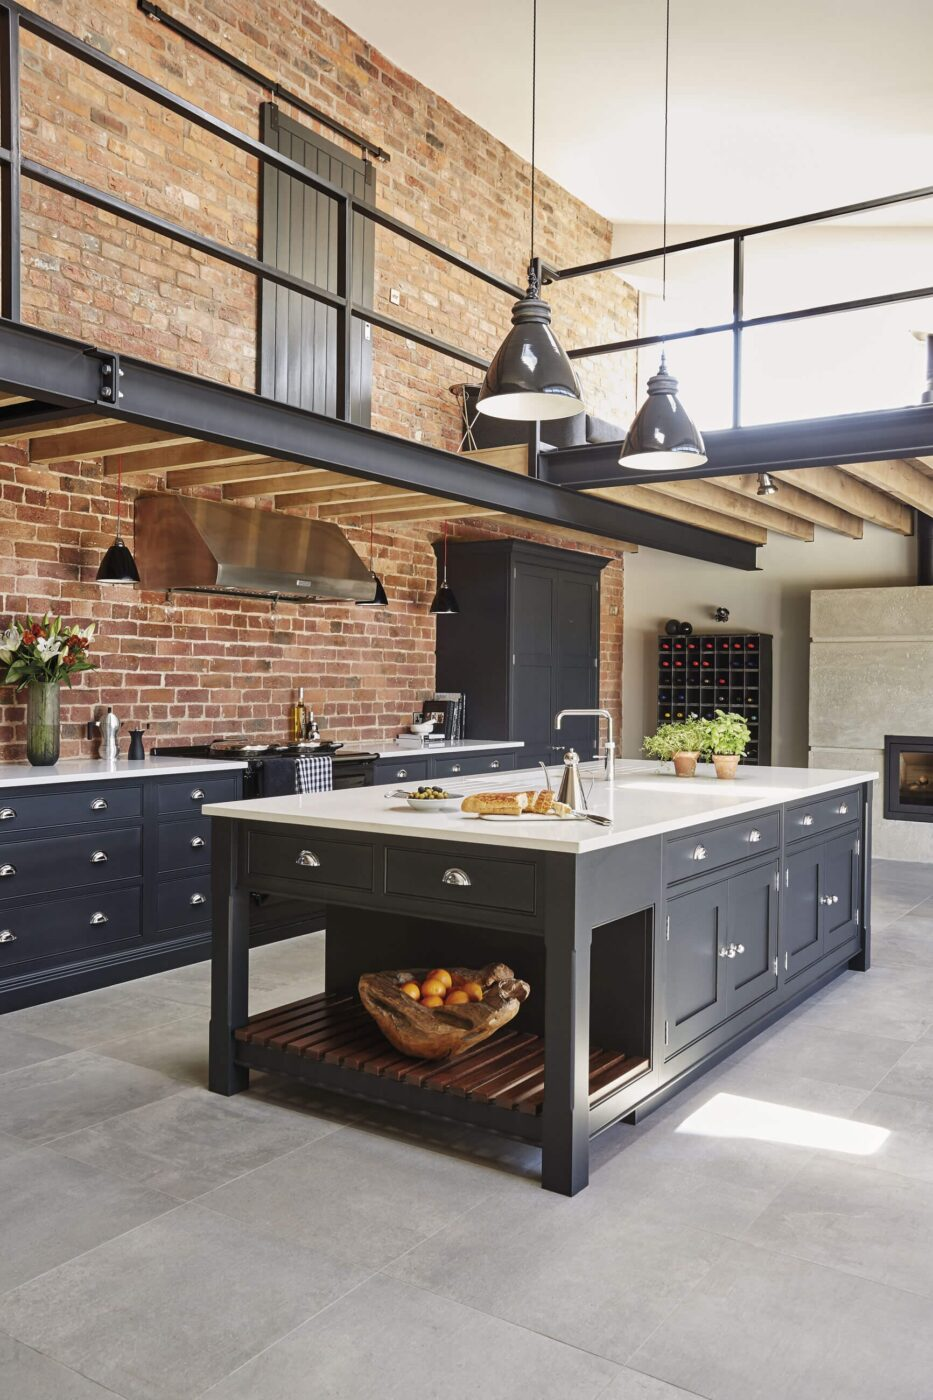 Image of american 5 1 in Sete ideias para refrescar a sua cozinha - Cosentino